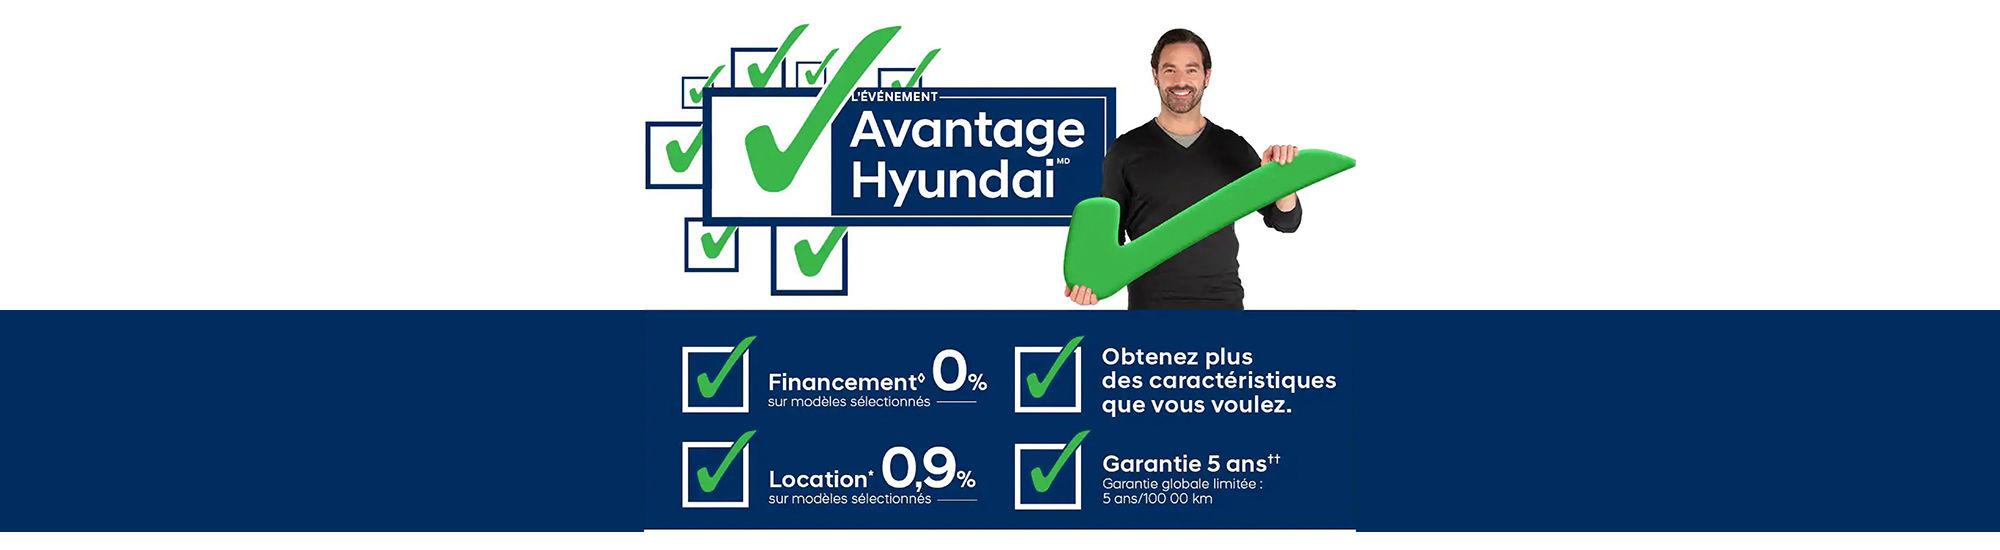 L'événement l'avantage Hyundai